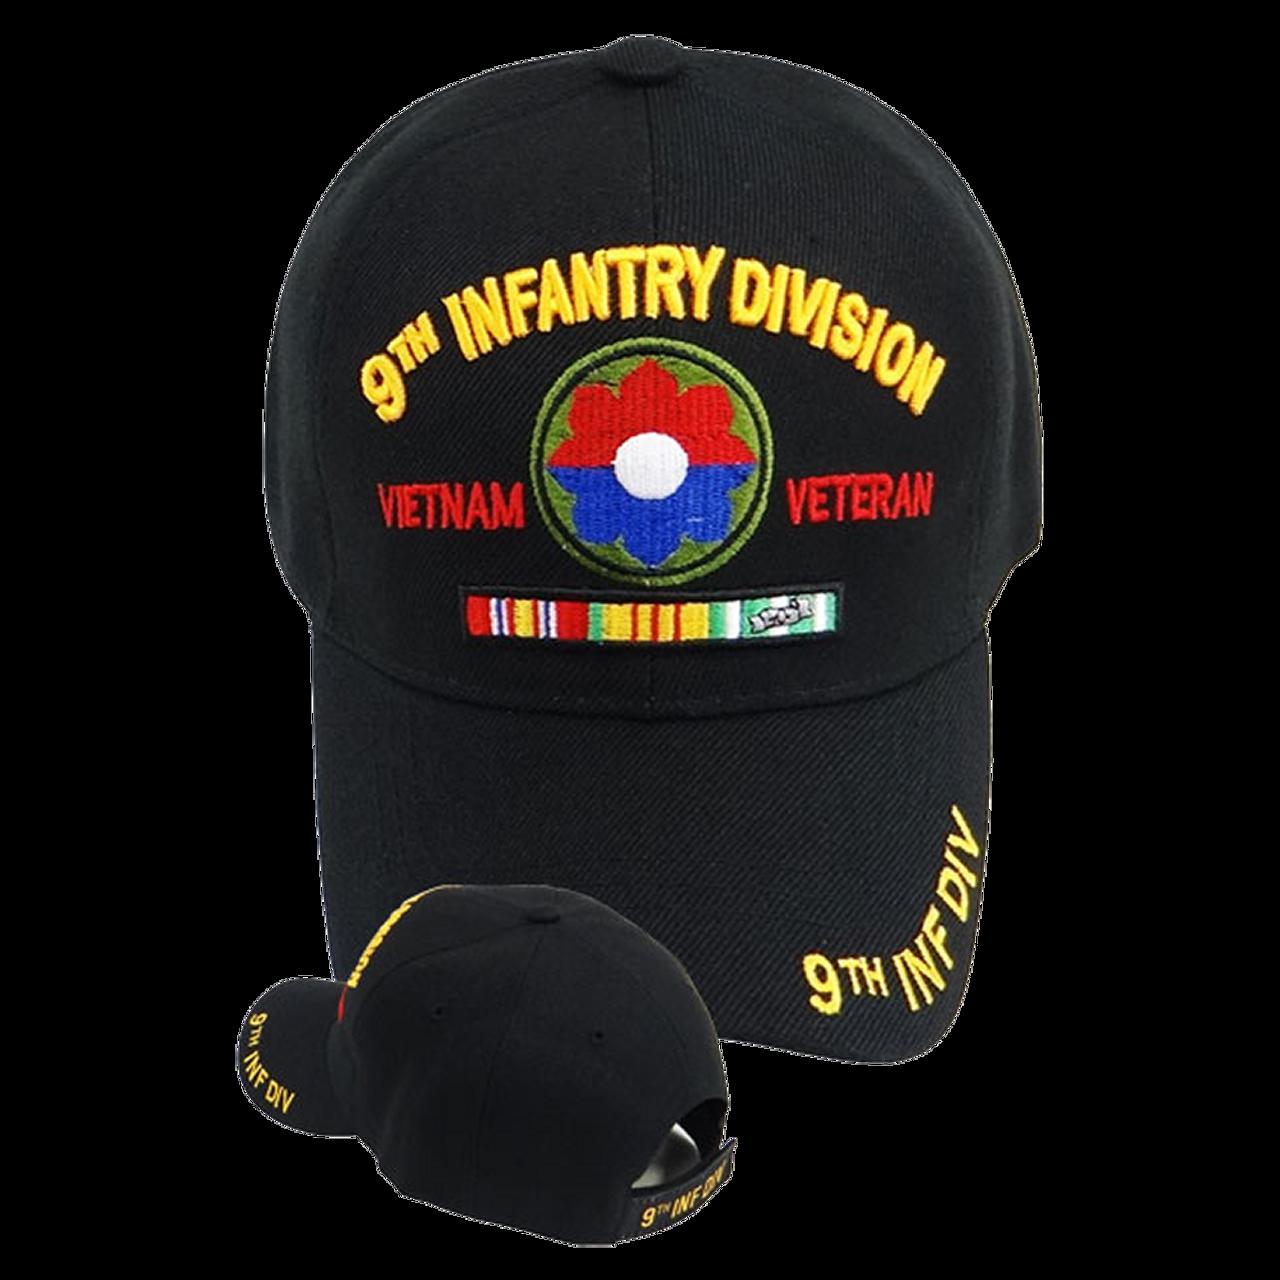 0616a3a2c58 Vietnam Veteran Caps 9th Infantry Division - US Military Hats